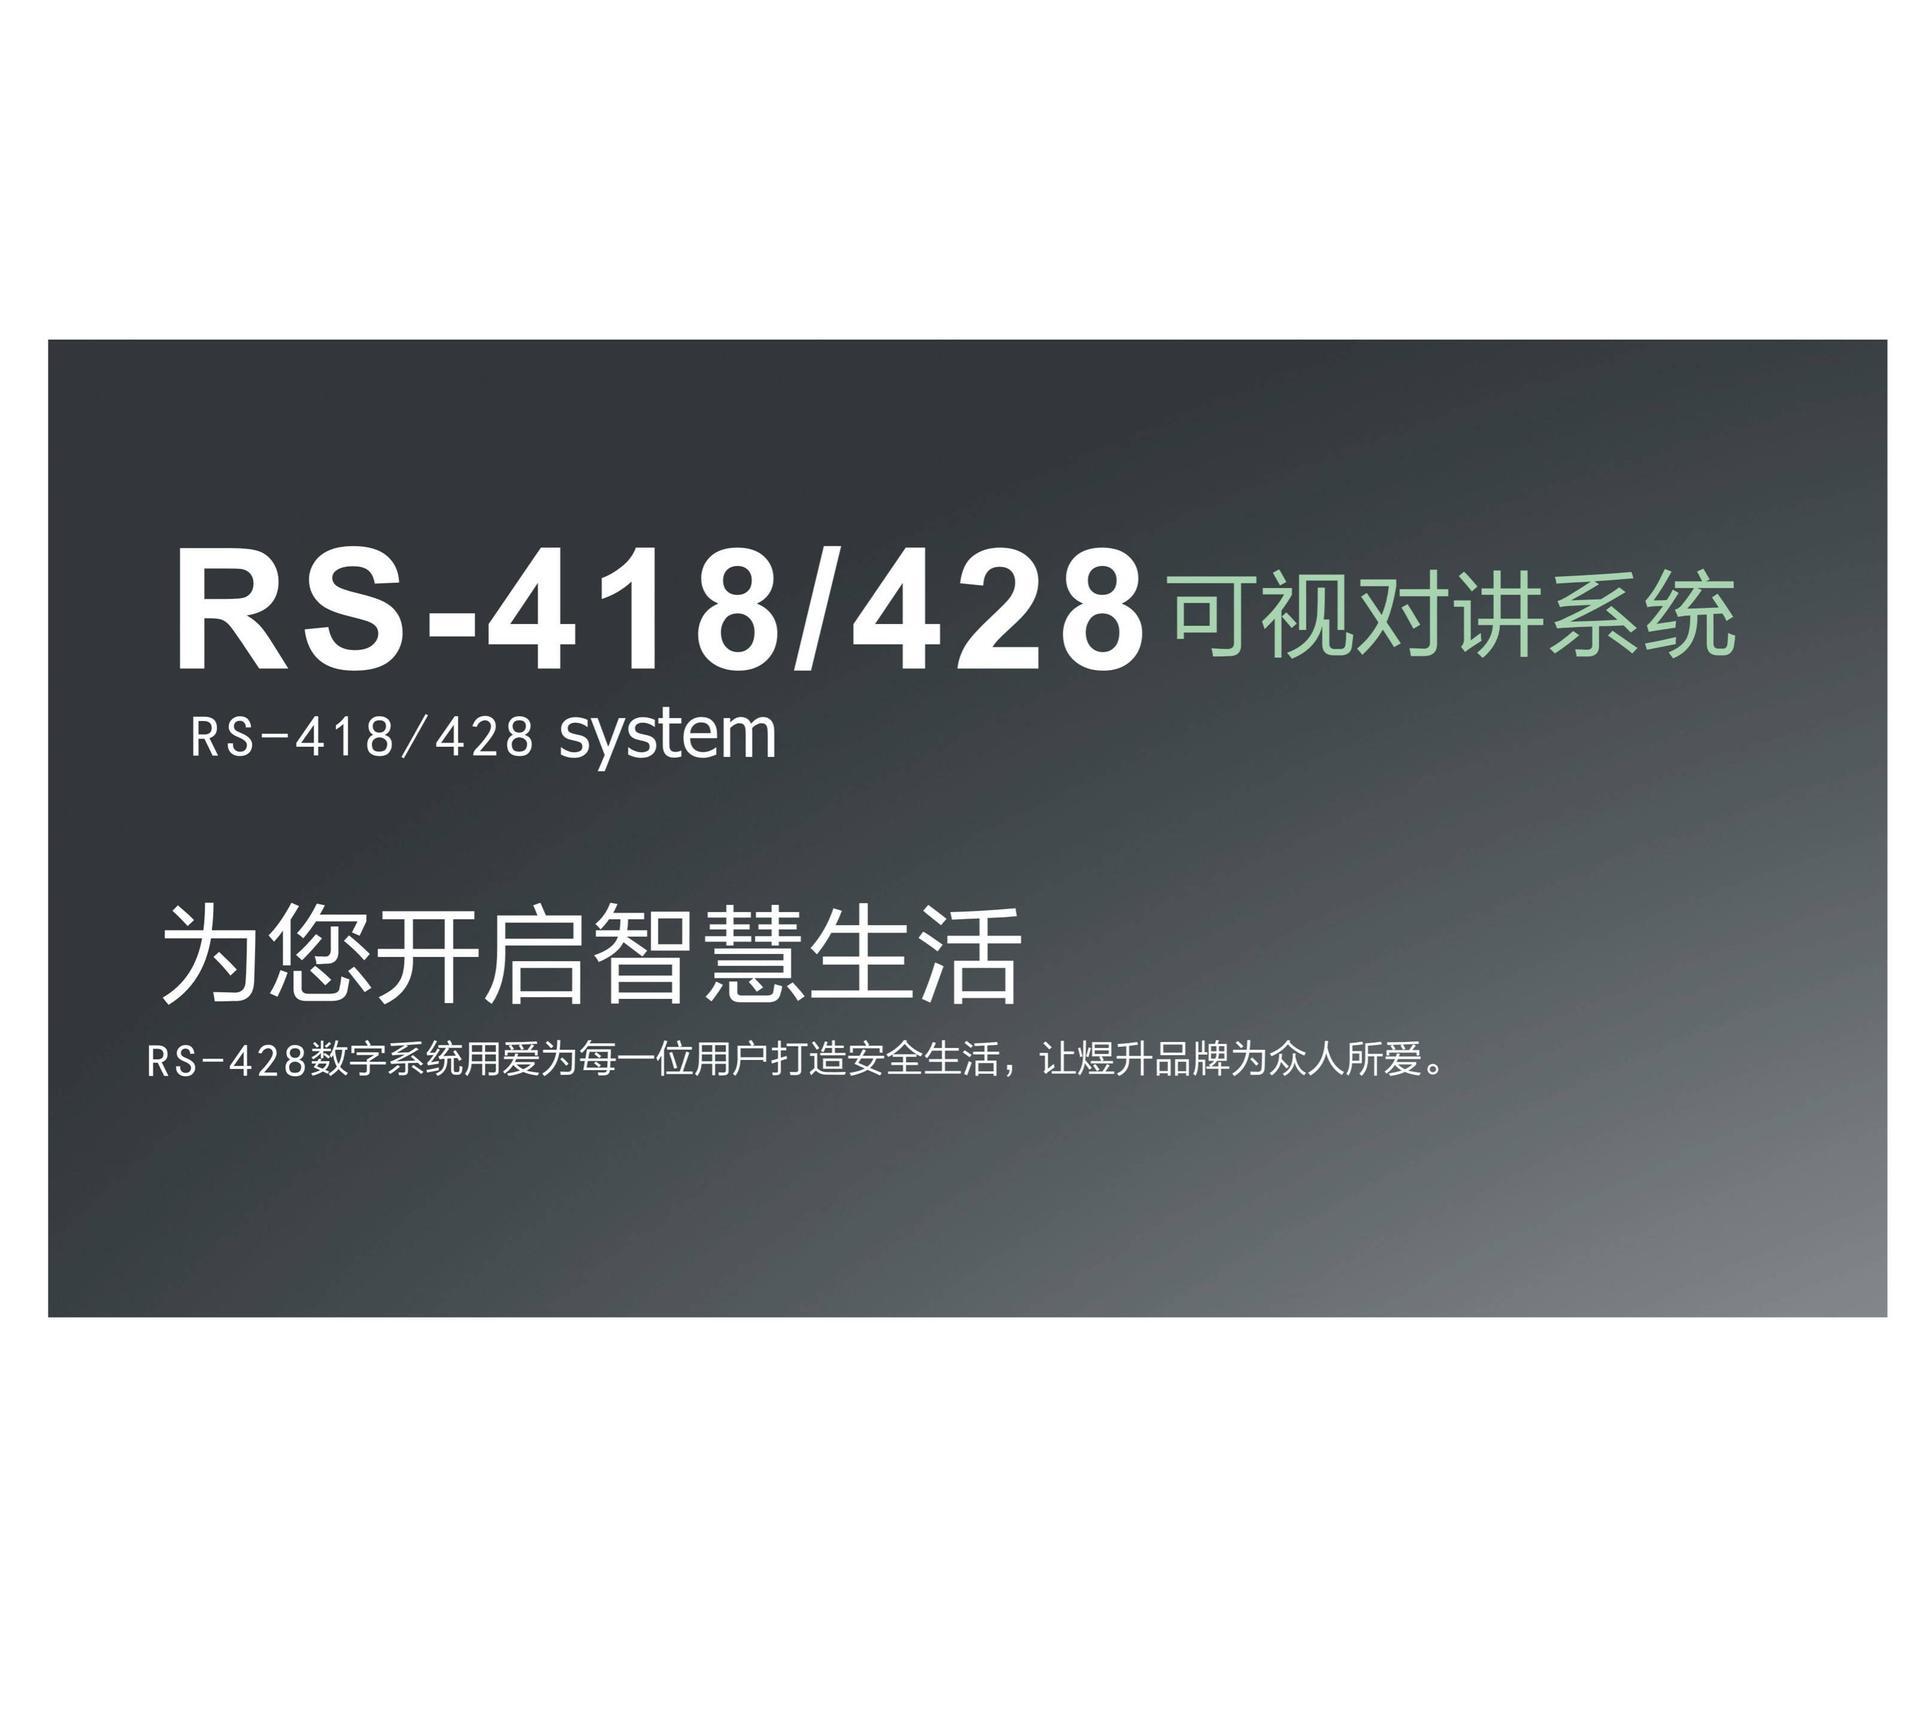 RS-418/428系统功能与优势